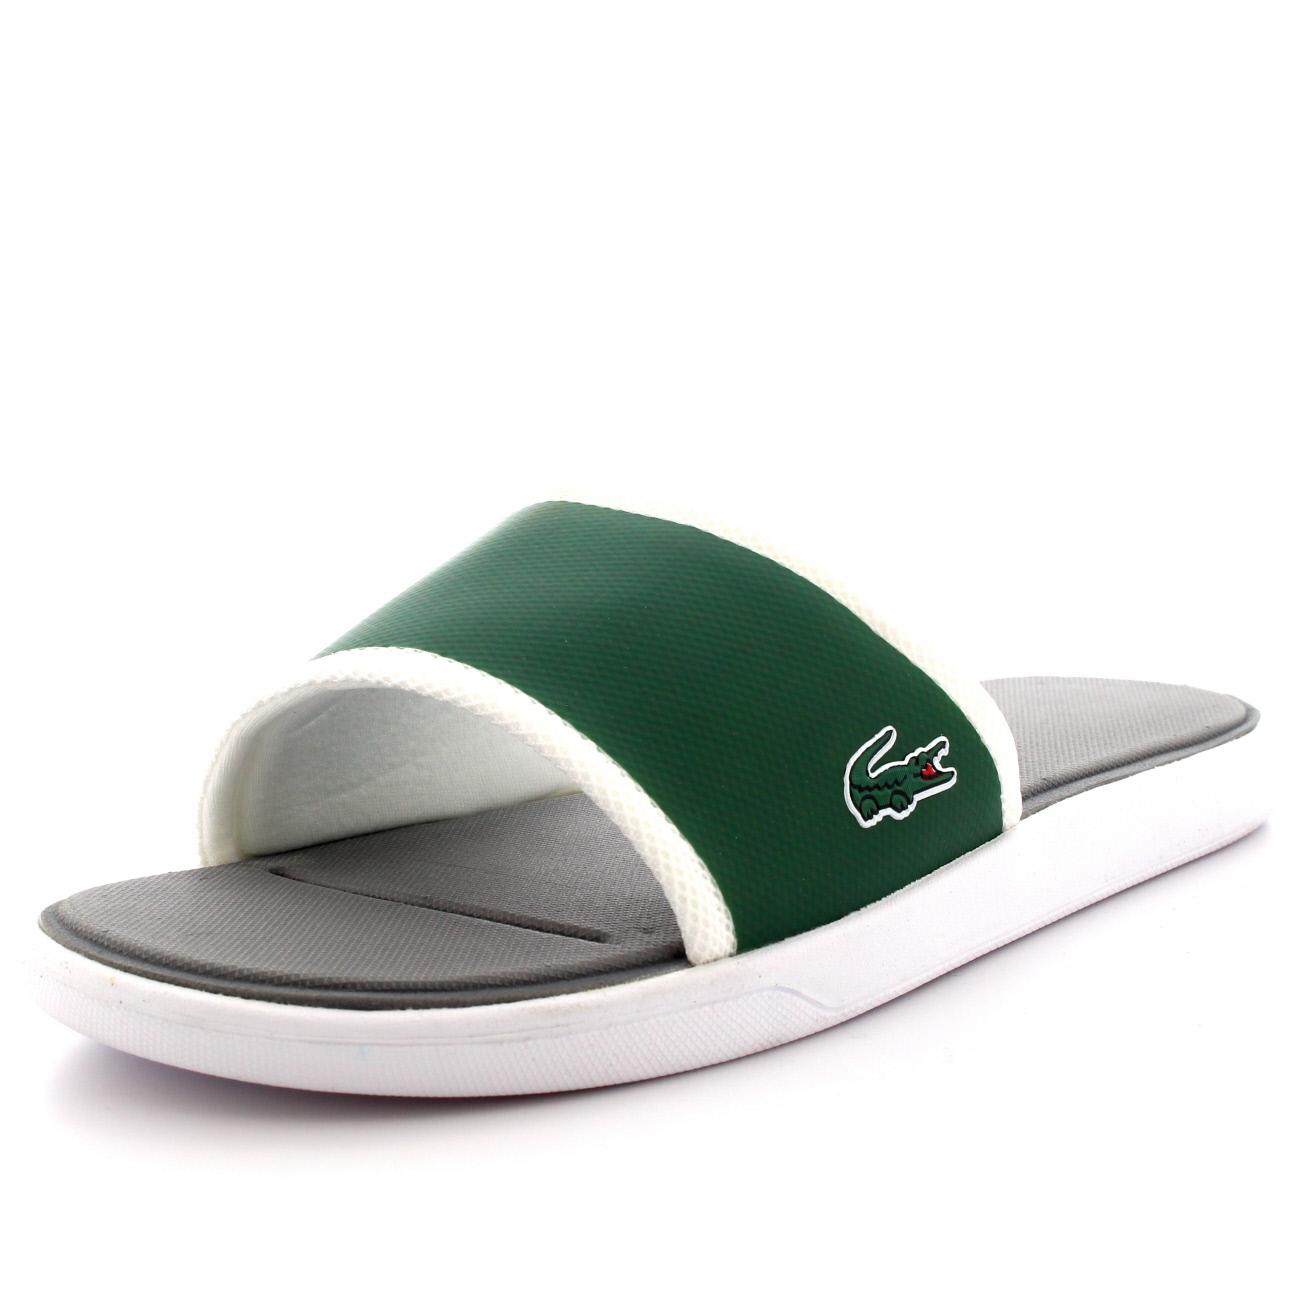 deec0f465 Lacoste L.30 Slide Sandal